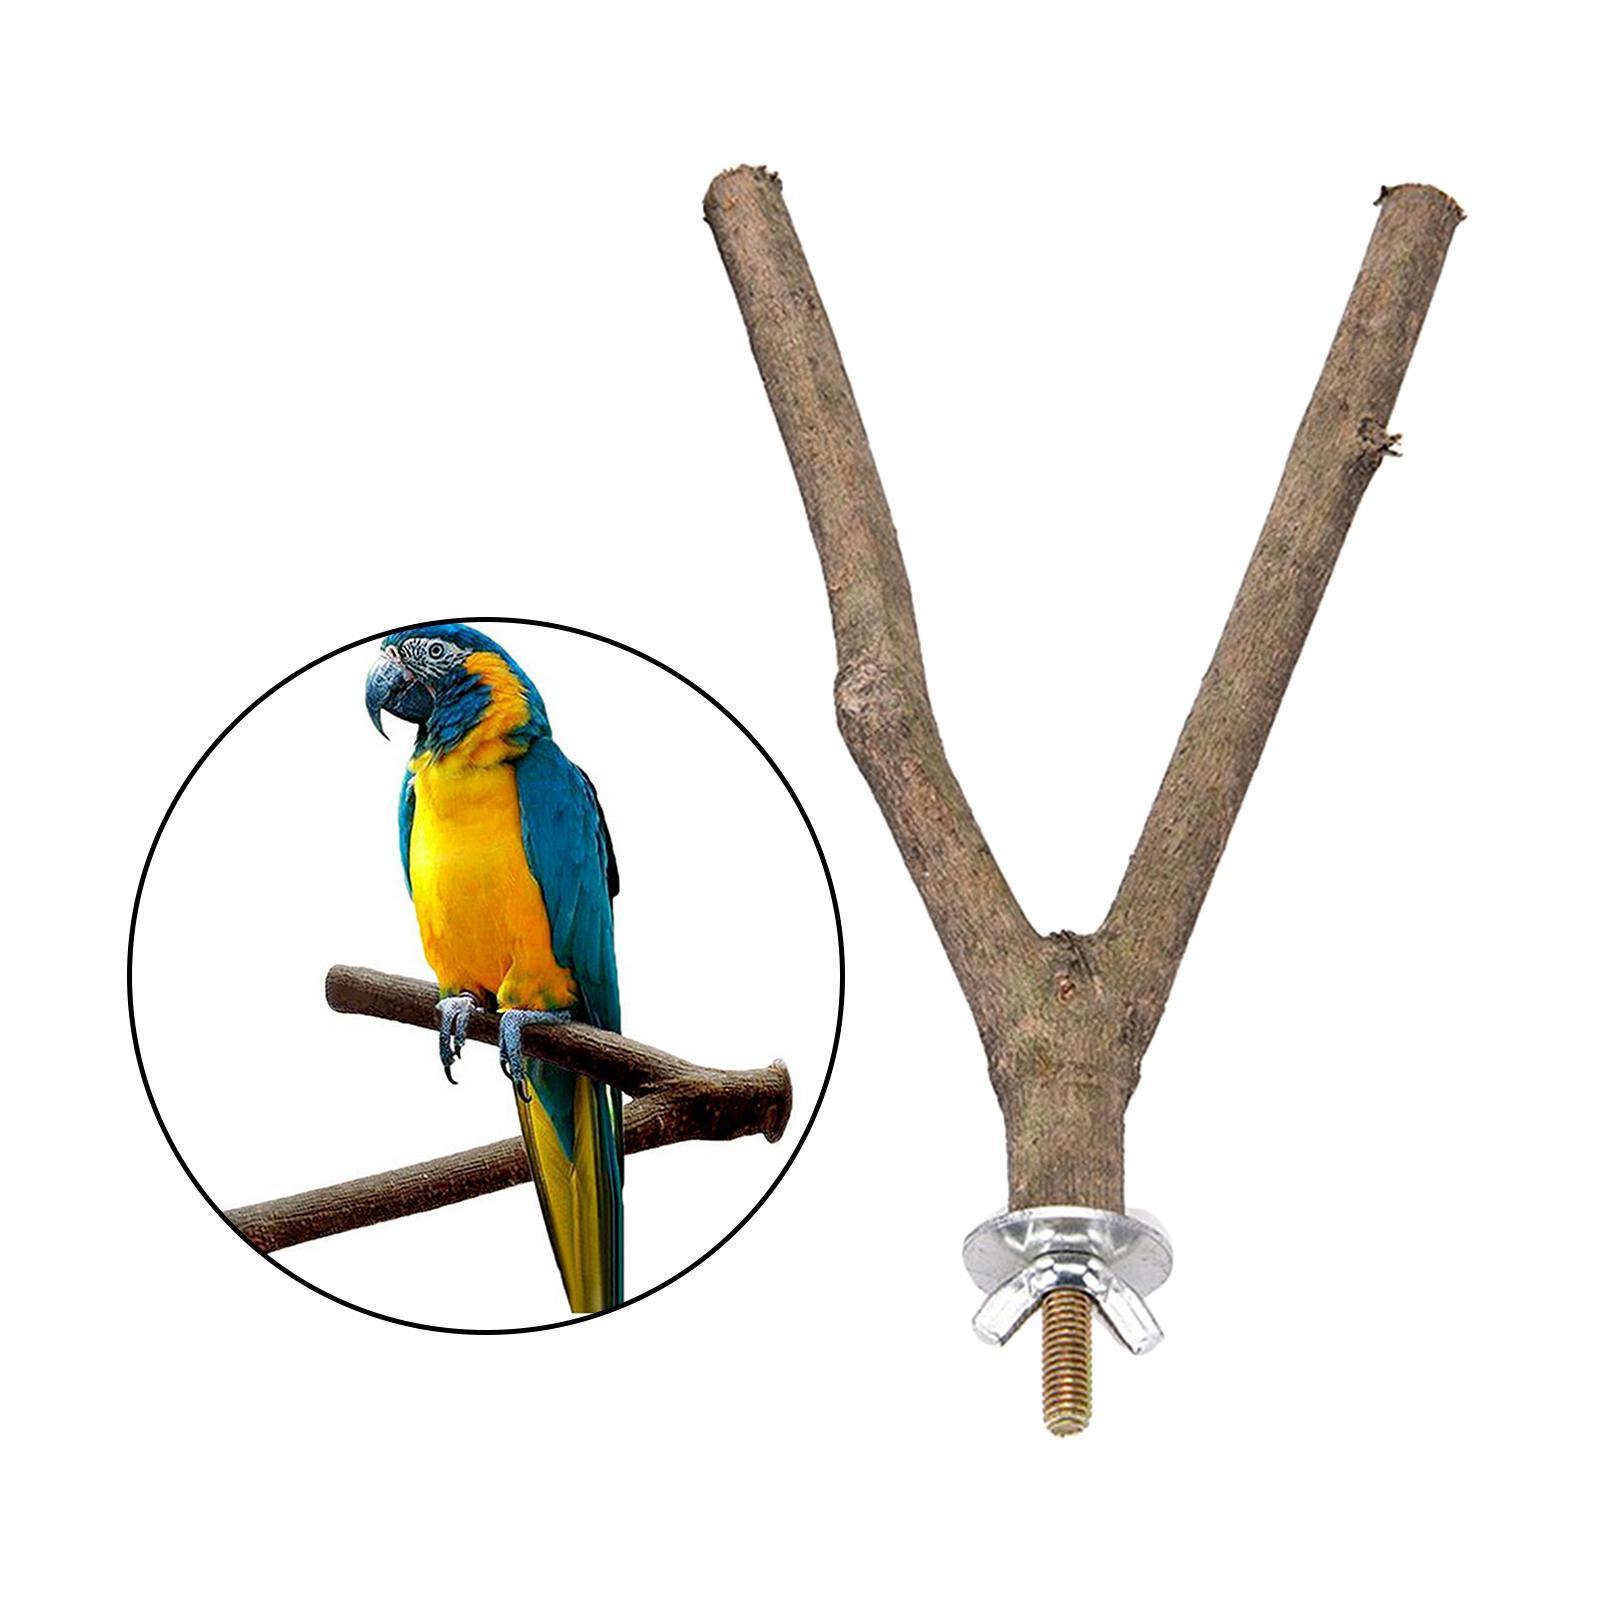 thumbnail 31 - Bird-Perch-Wood-Stand-Bird-Cage-Swing-Branch-for-Parrot-Parakeet-Cockatiel